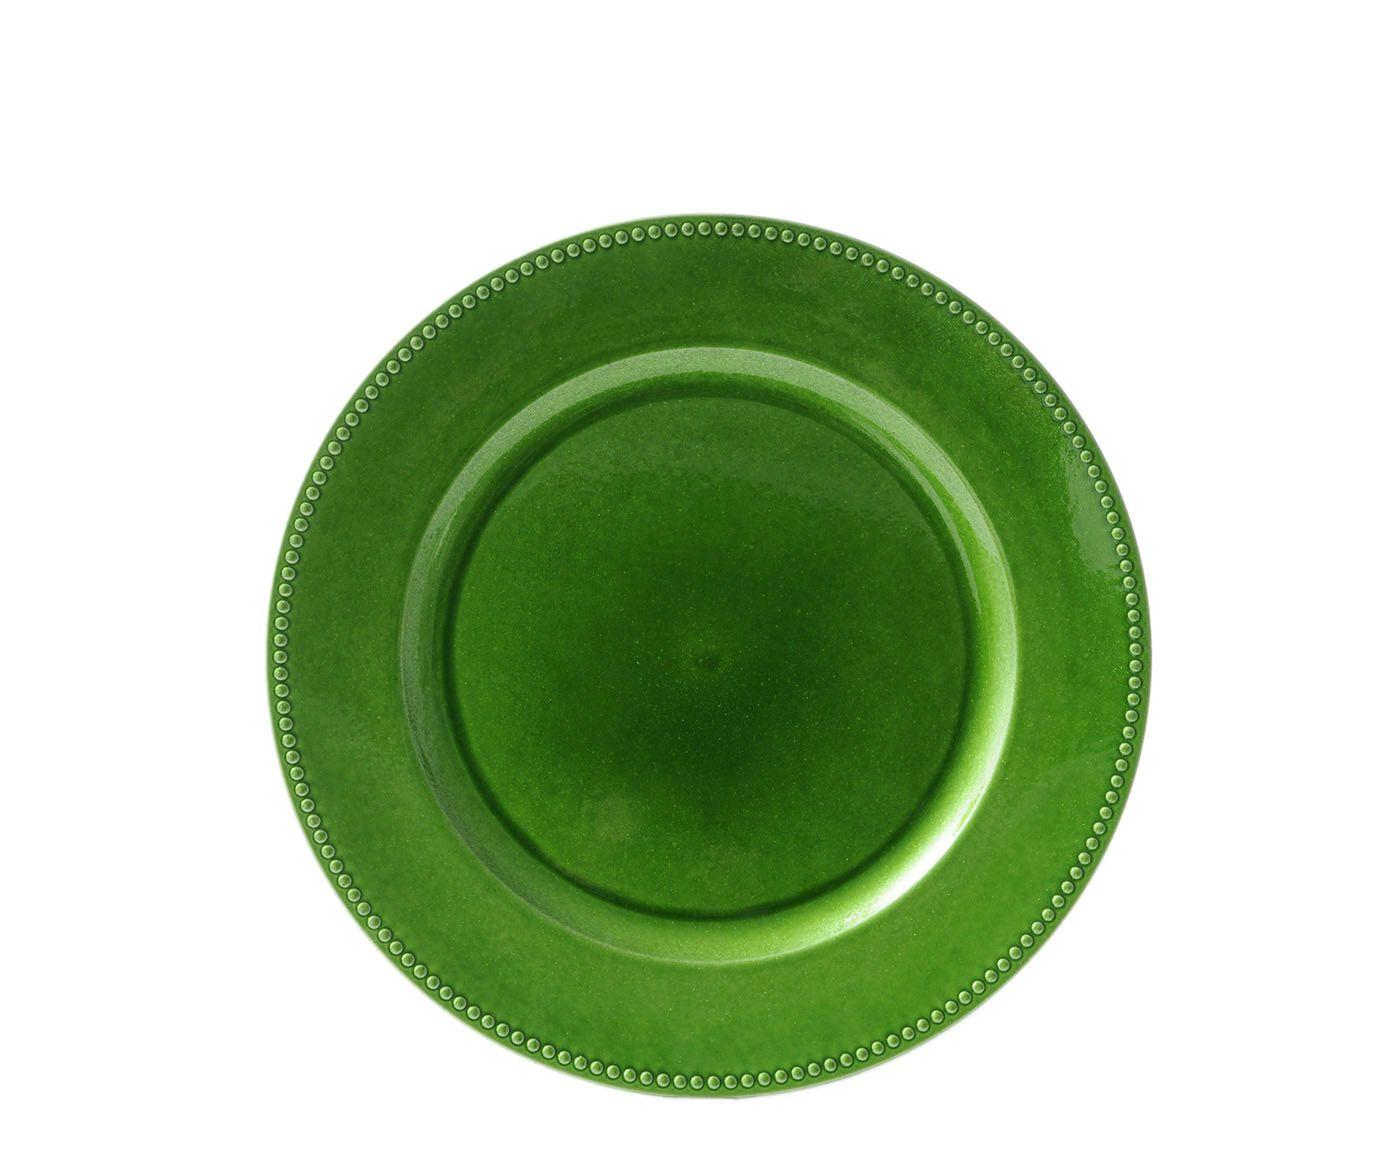 Sousplat Cloe Verde - 33cm | Westwing.com.br